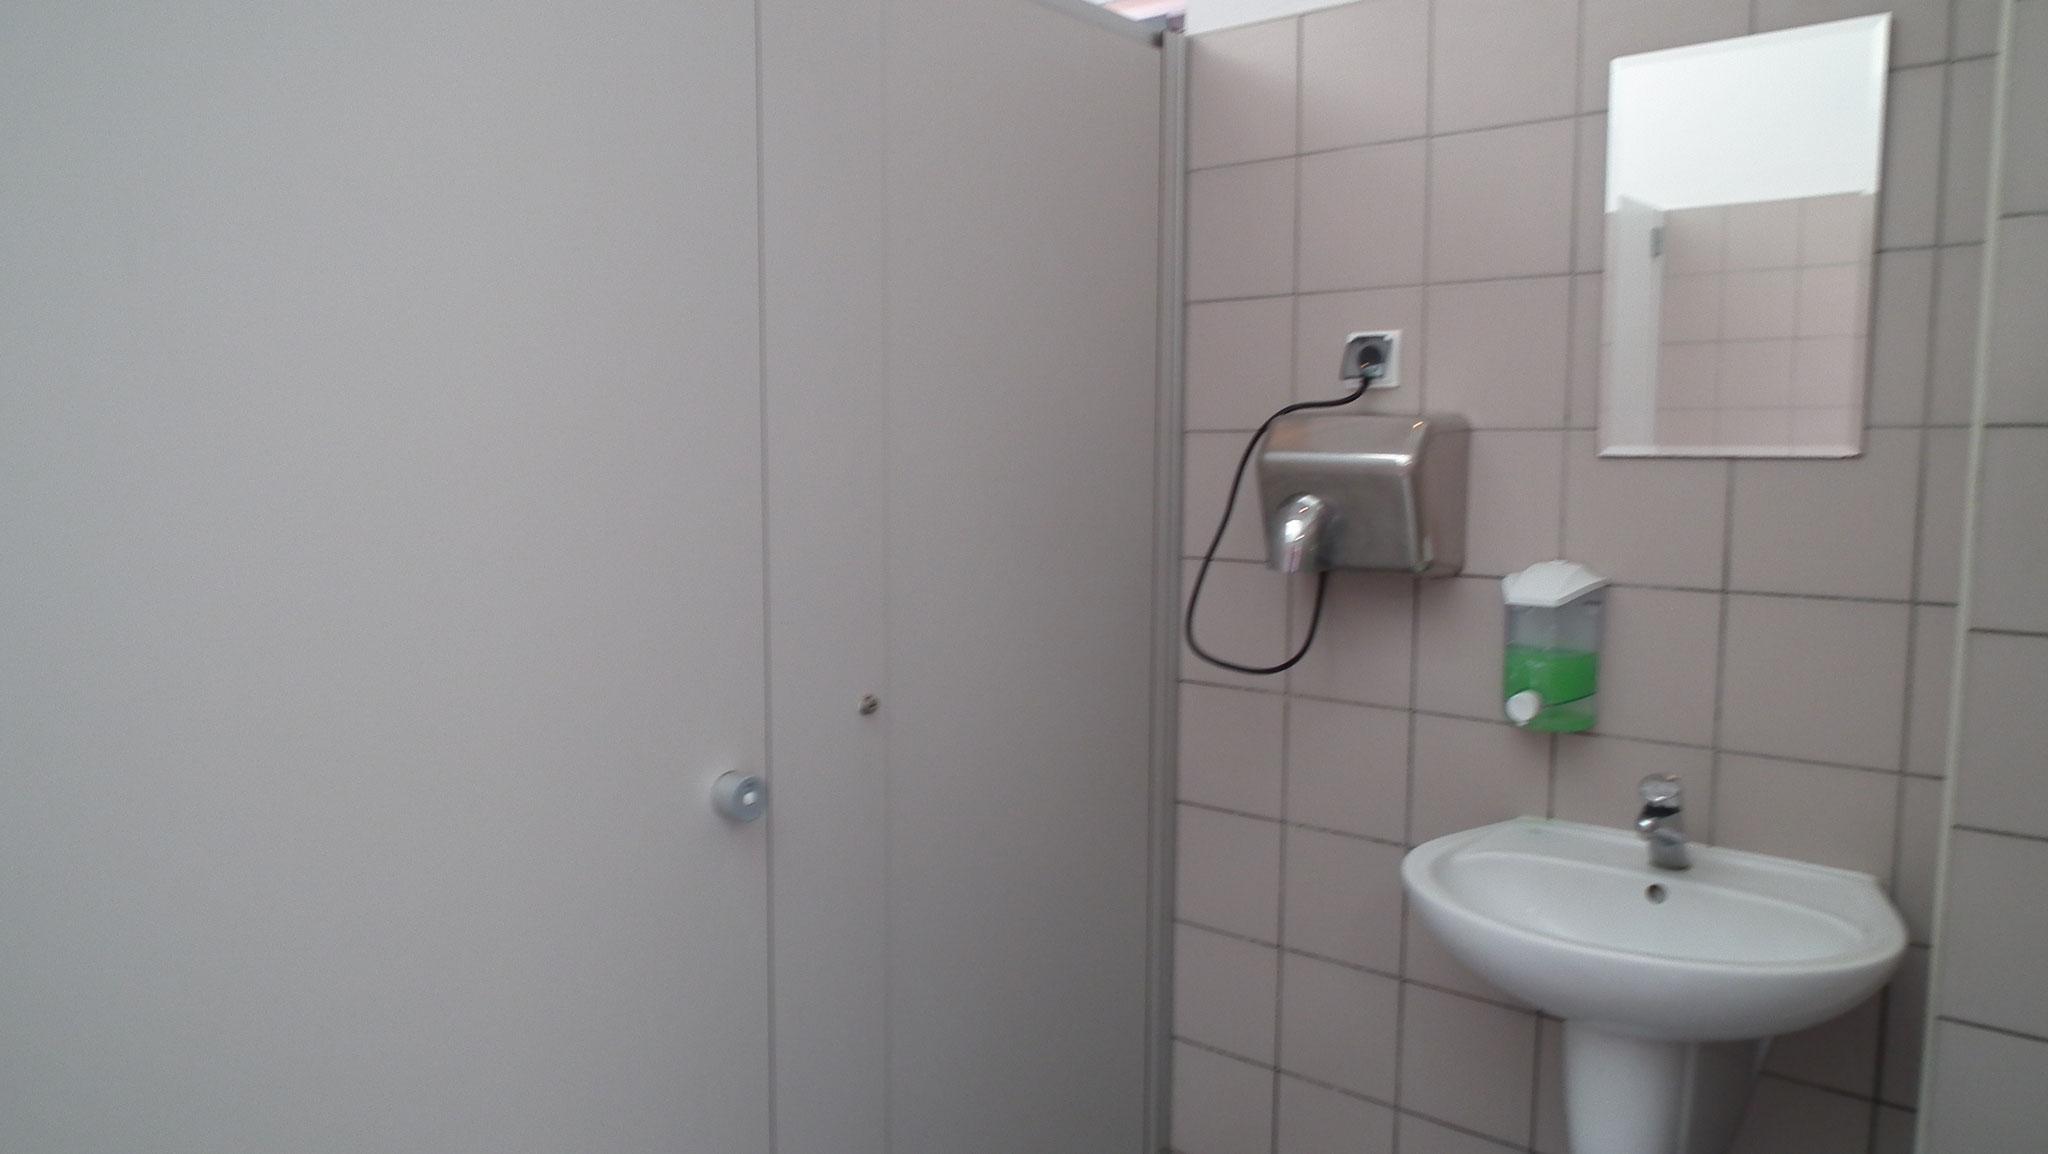 Sanitäranlage Dievenow